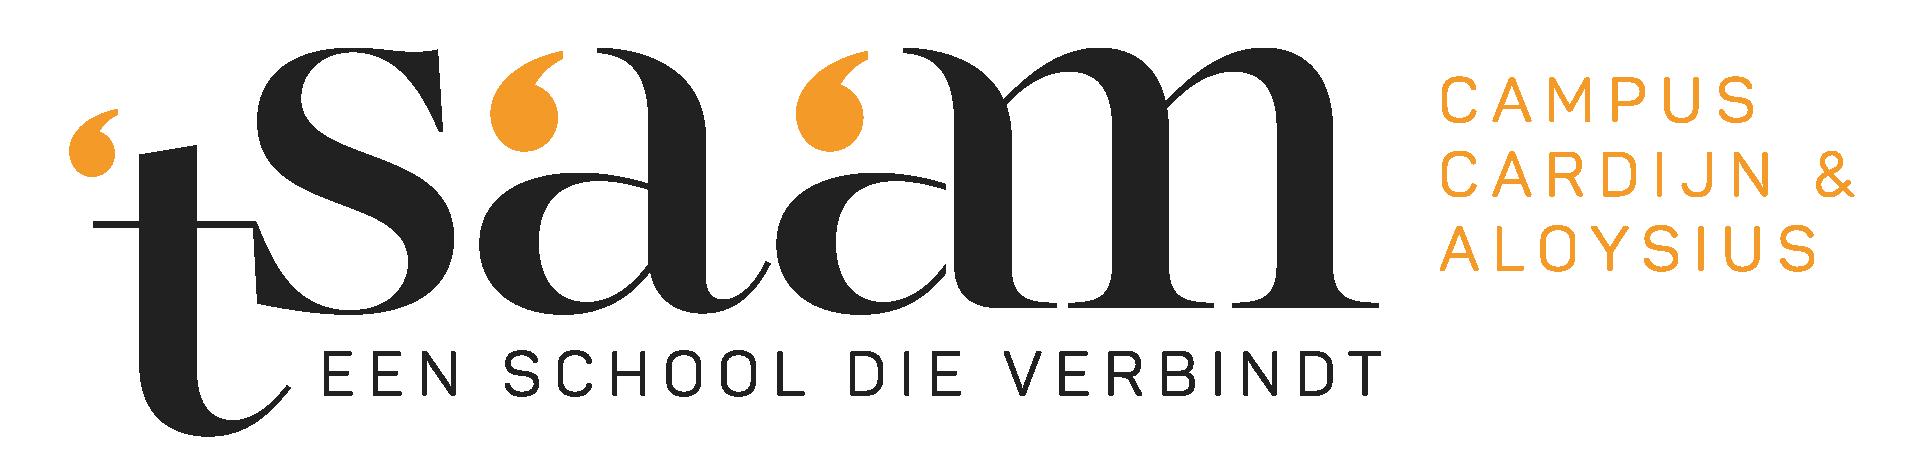 Tsaam Campus Cardijn - Secundair onderwijs Diksmuide